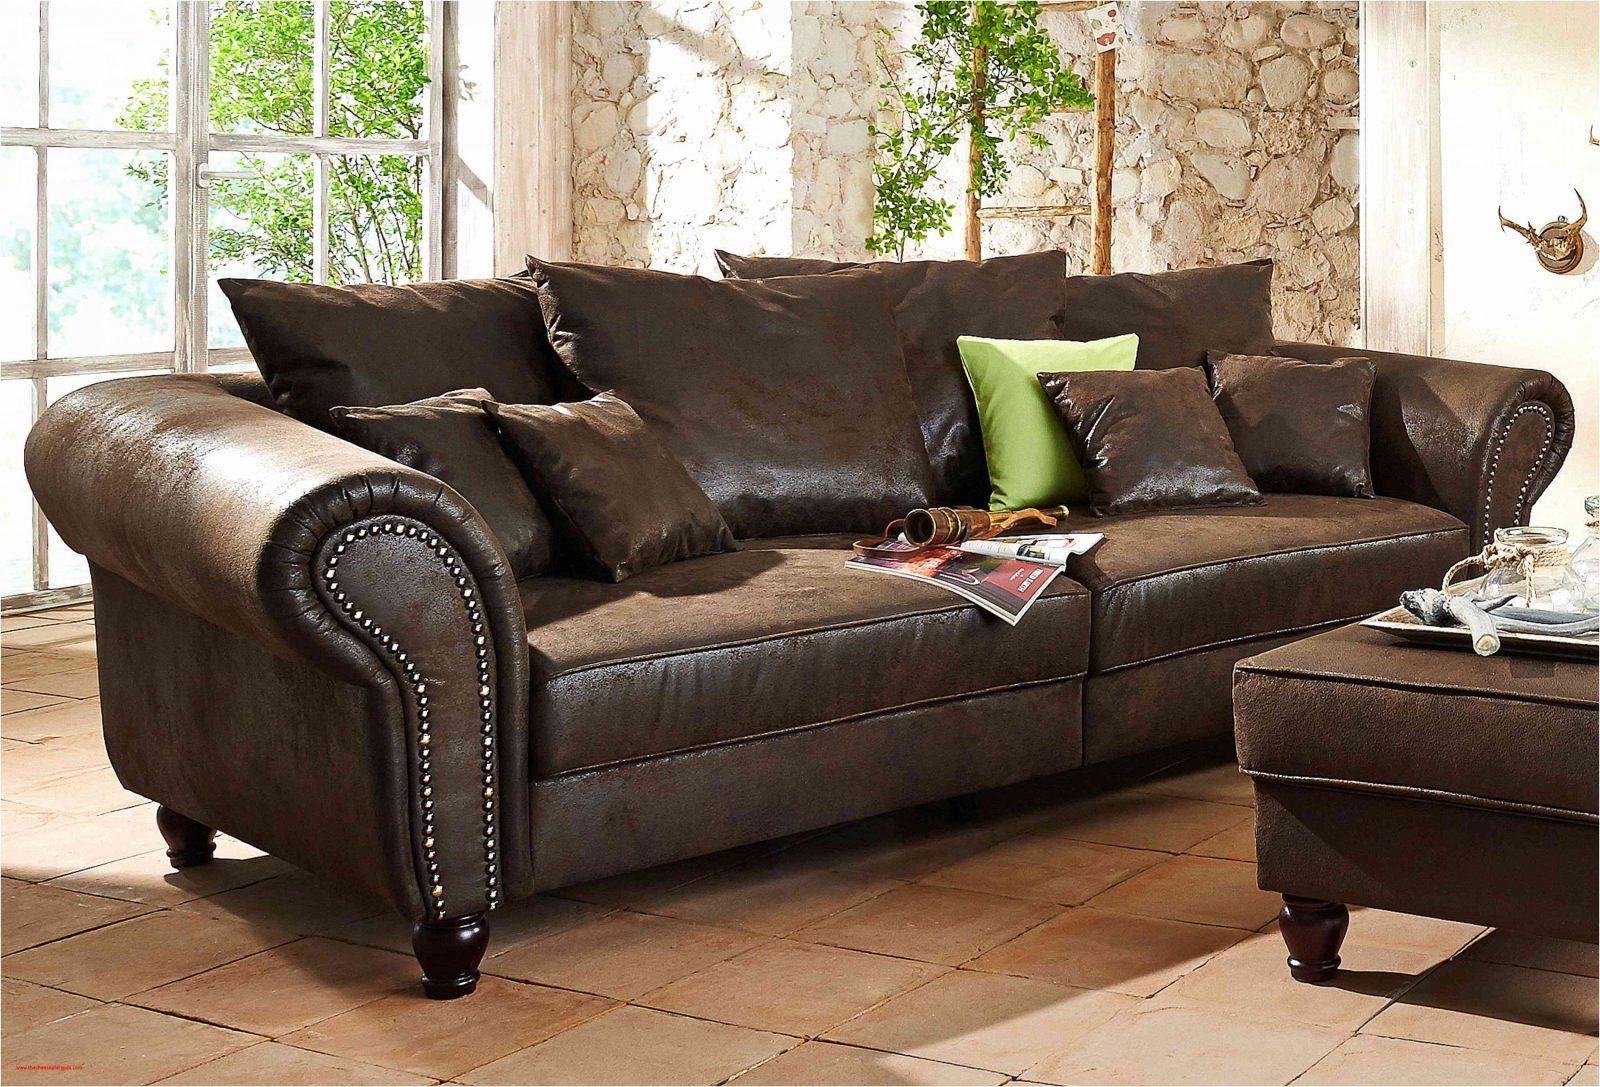 Big Sofa Xxl Gunstig Kaufen Big Sofa Zu Kaufen